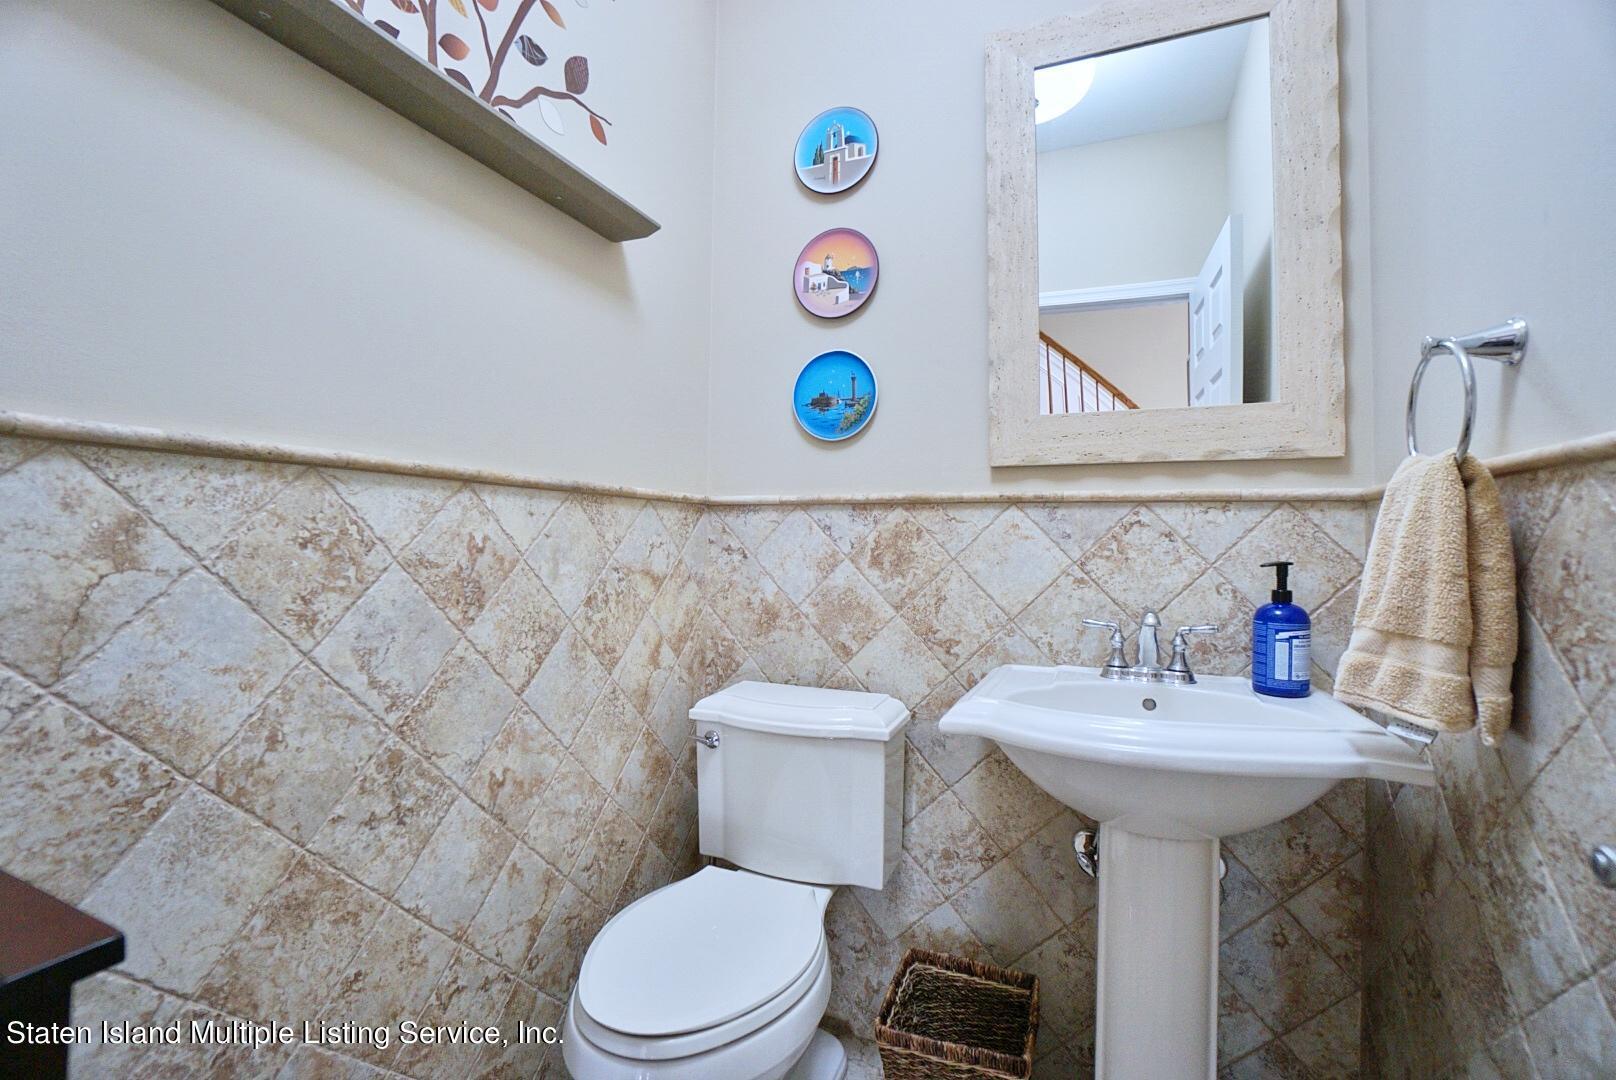 Single Family - Detached 31 Belwood Loop  Staten Island, NY 10307, MLS-1143133-14